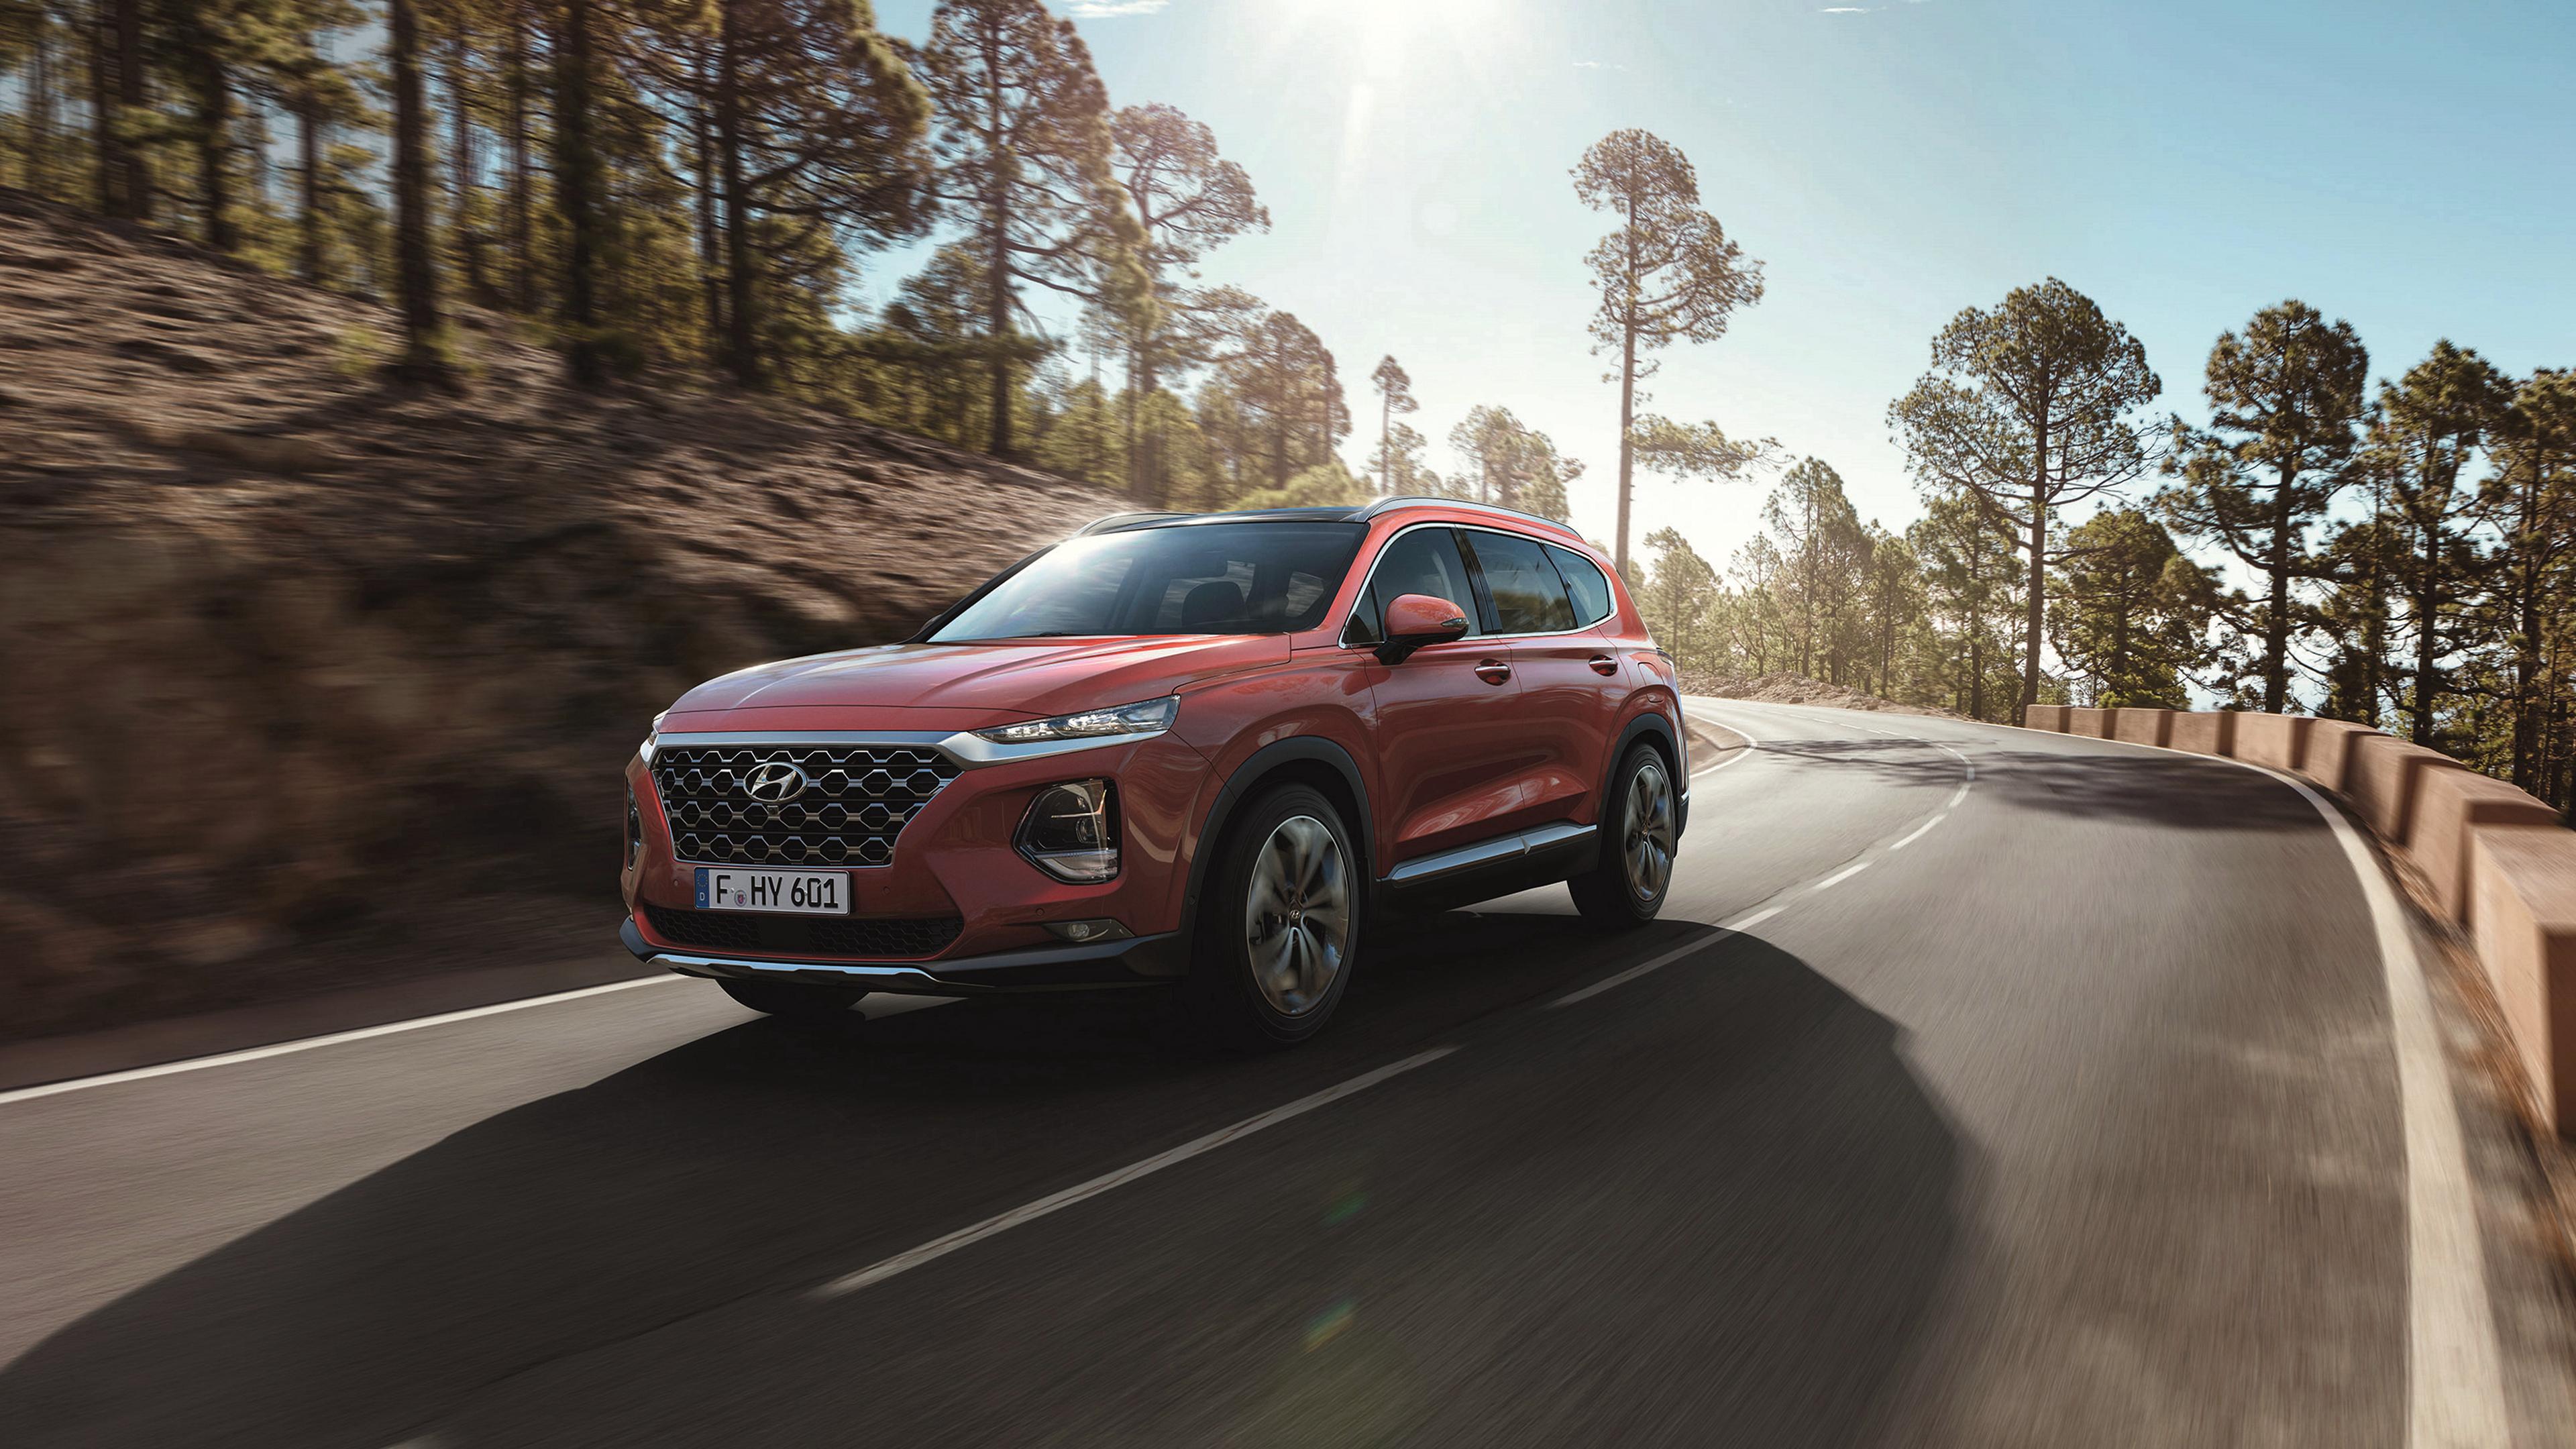 Image result for Hyundai Santa Fe wallpaper